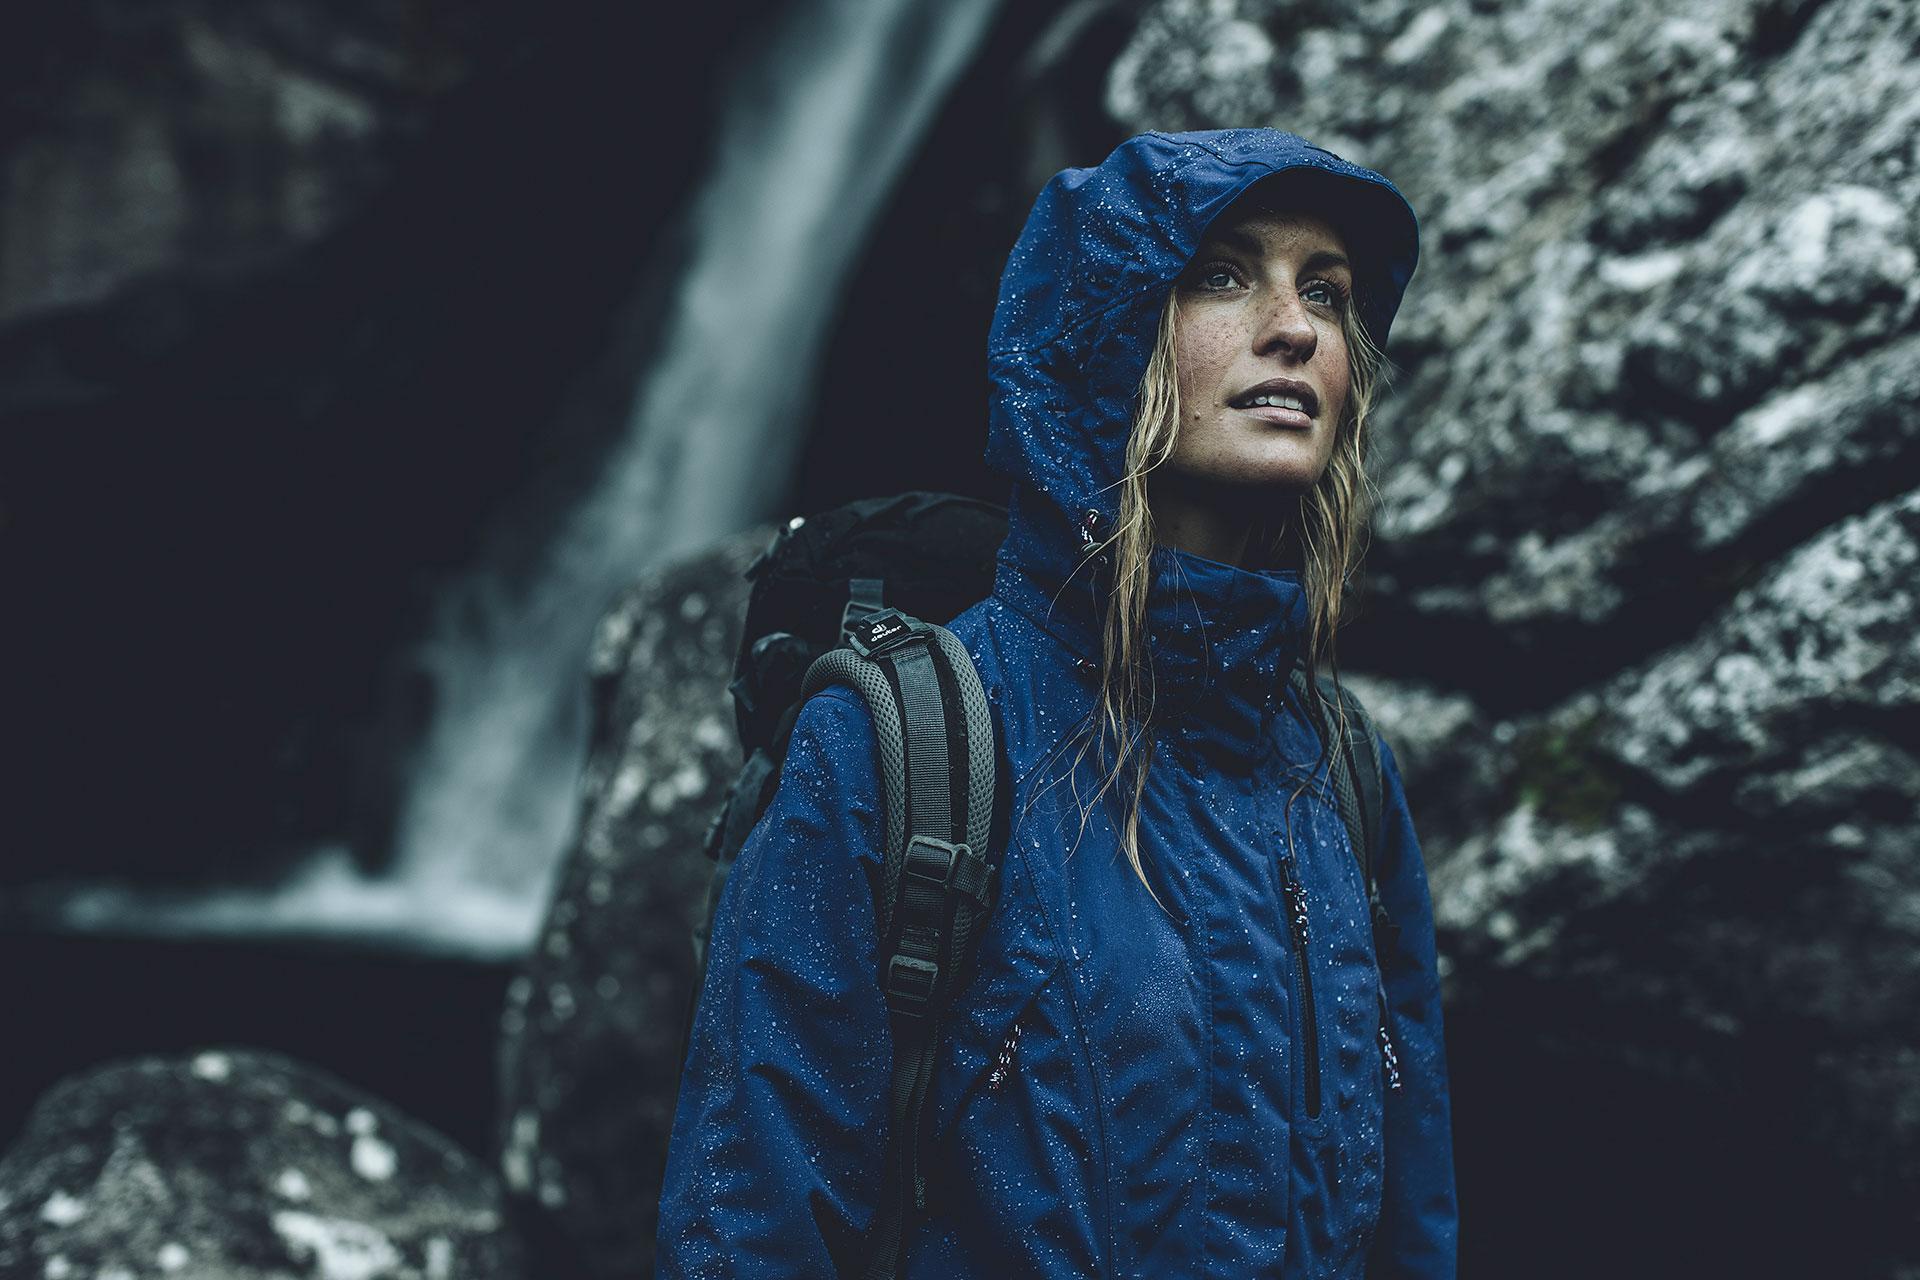 fotograf sport outdoor wandern trekking schoeffel berge seealpen schweiz zuerich